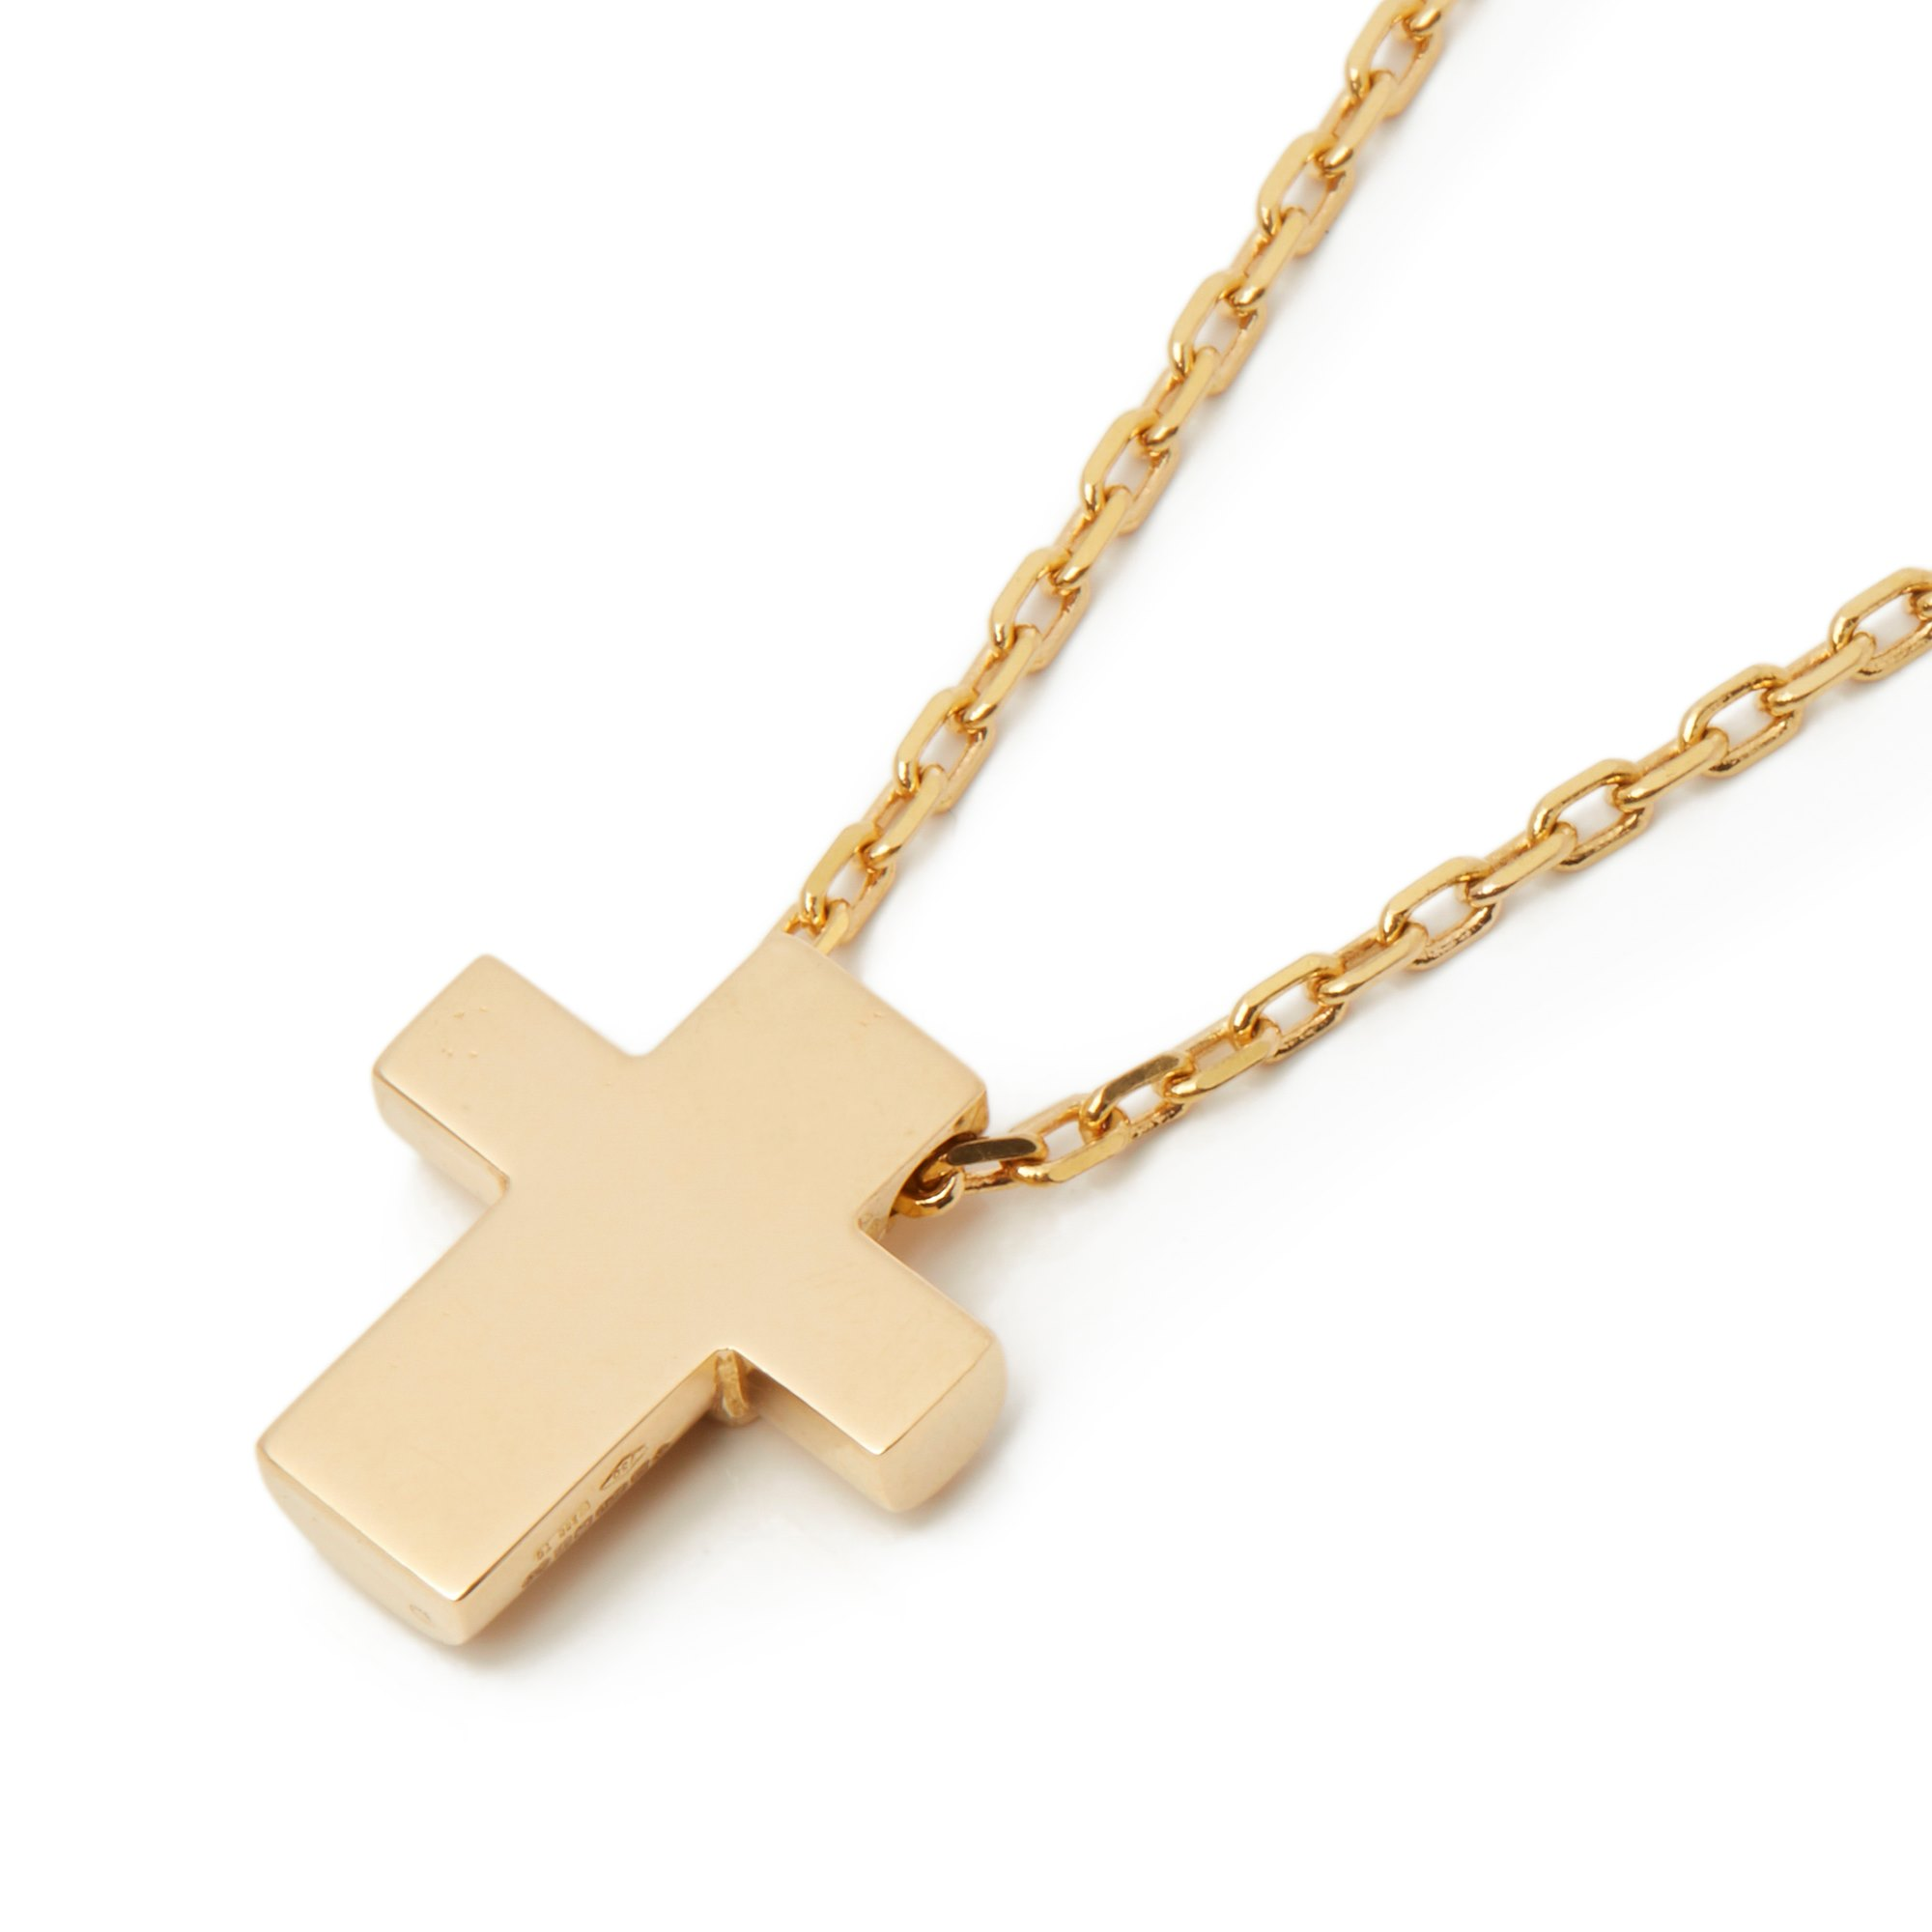 Asprey 18k Yellow Gold Cross Pendant Necklace - Image 7 of 8